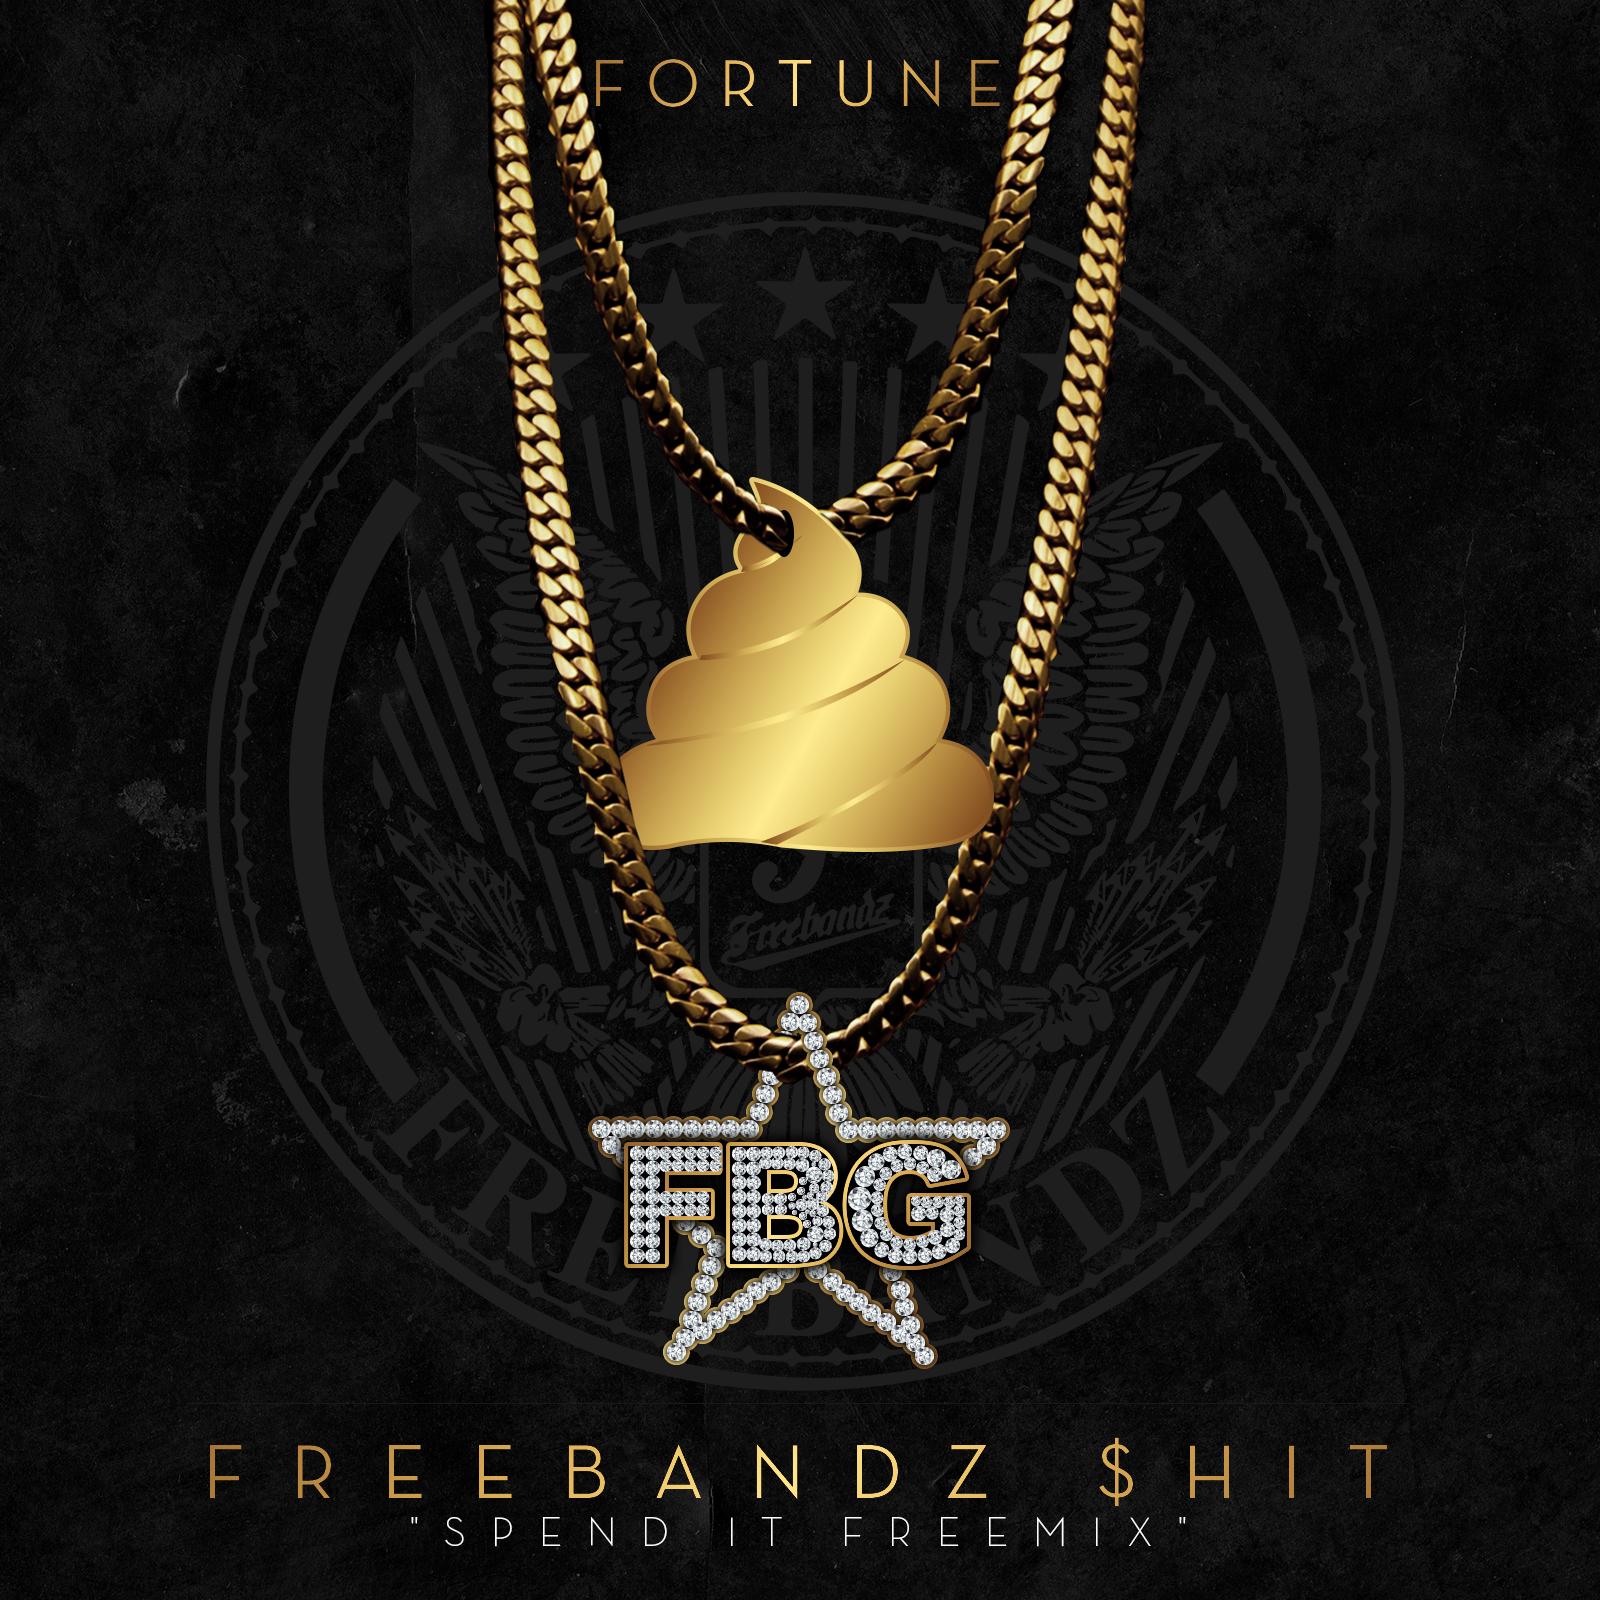 FORTUNE FREEBANDZ $HIT